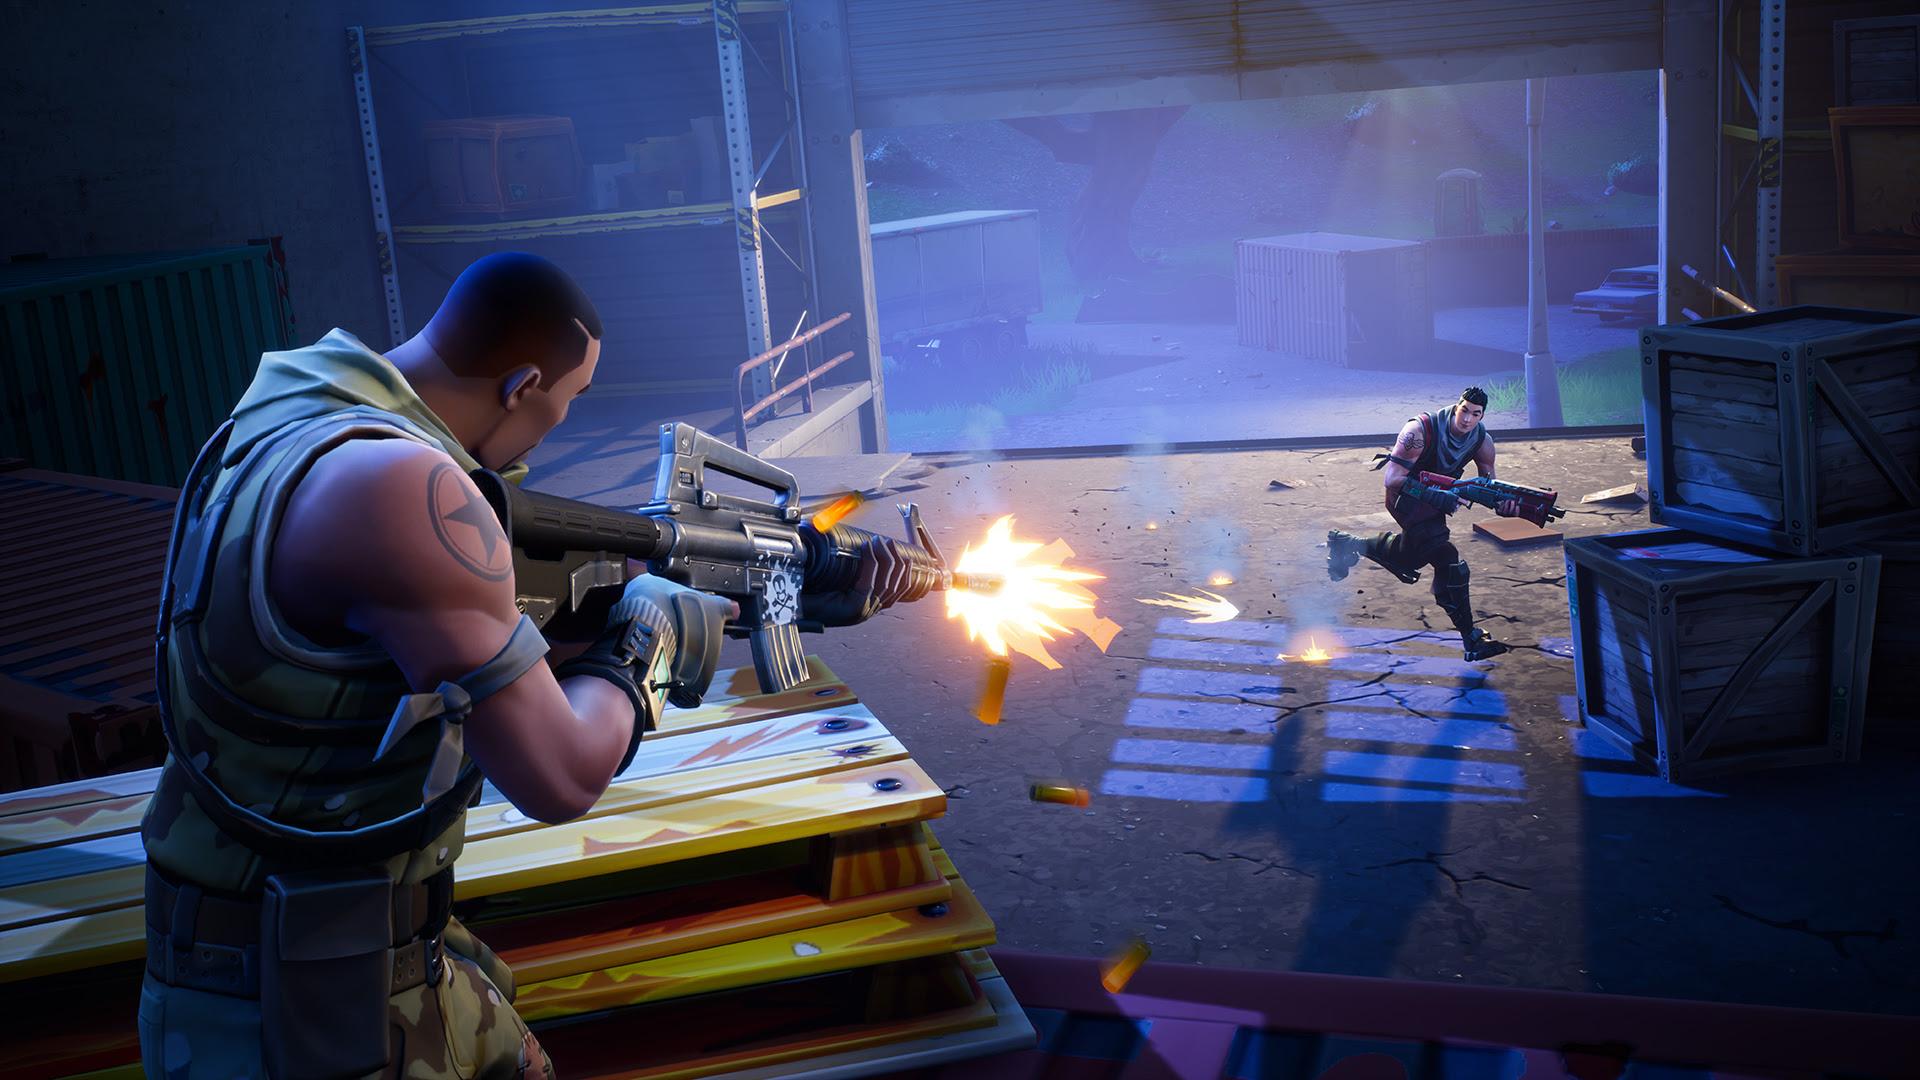 Fortnite's Battle Royale mode goes free next week screenshot